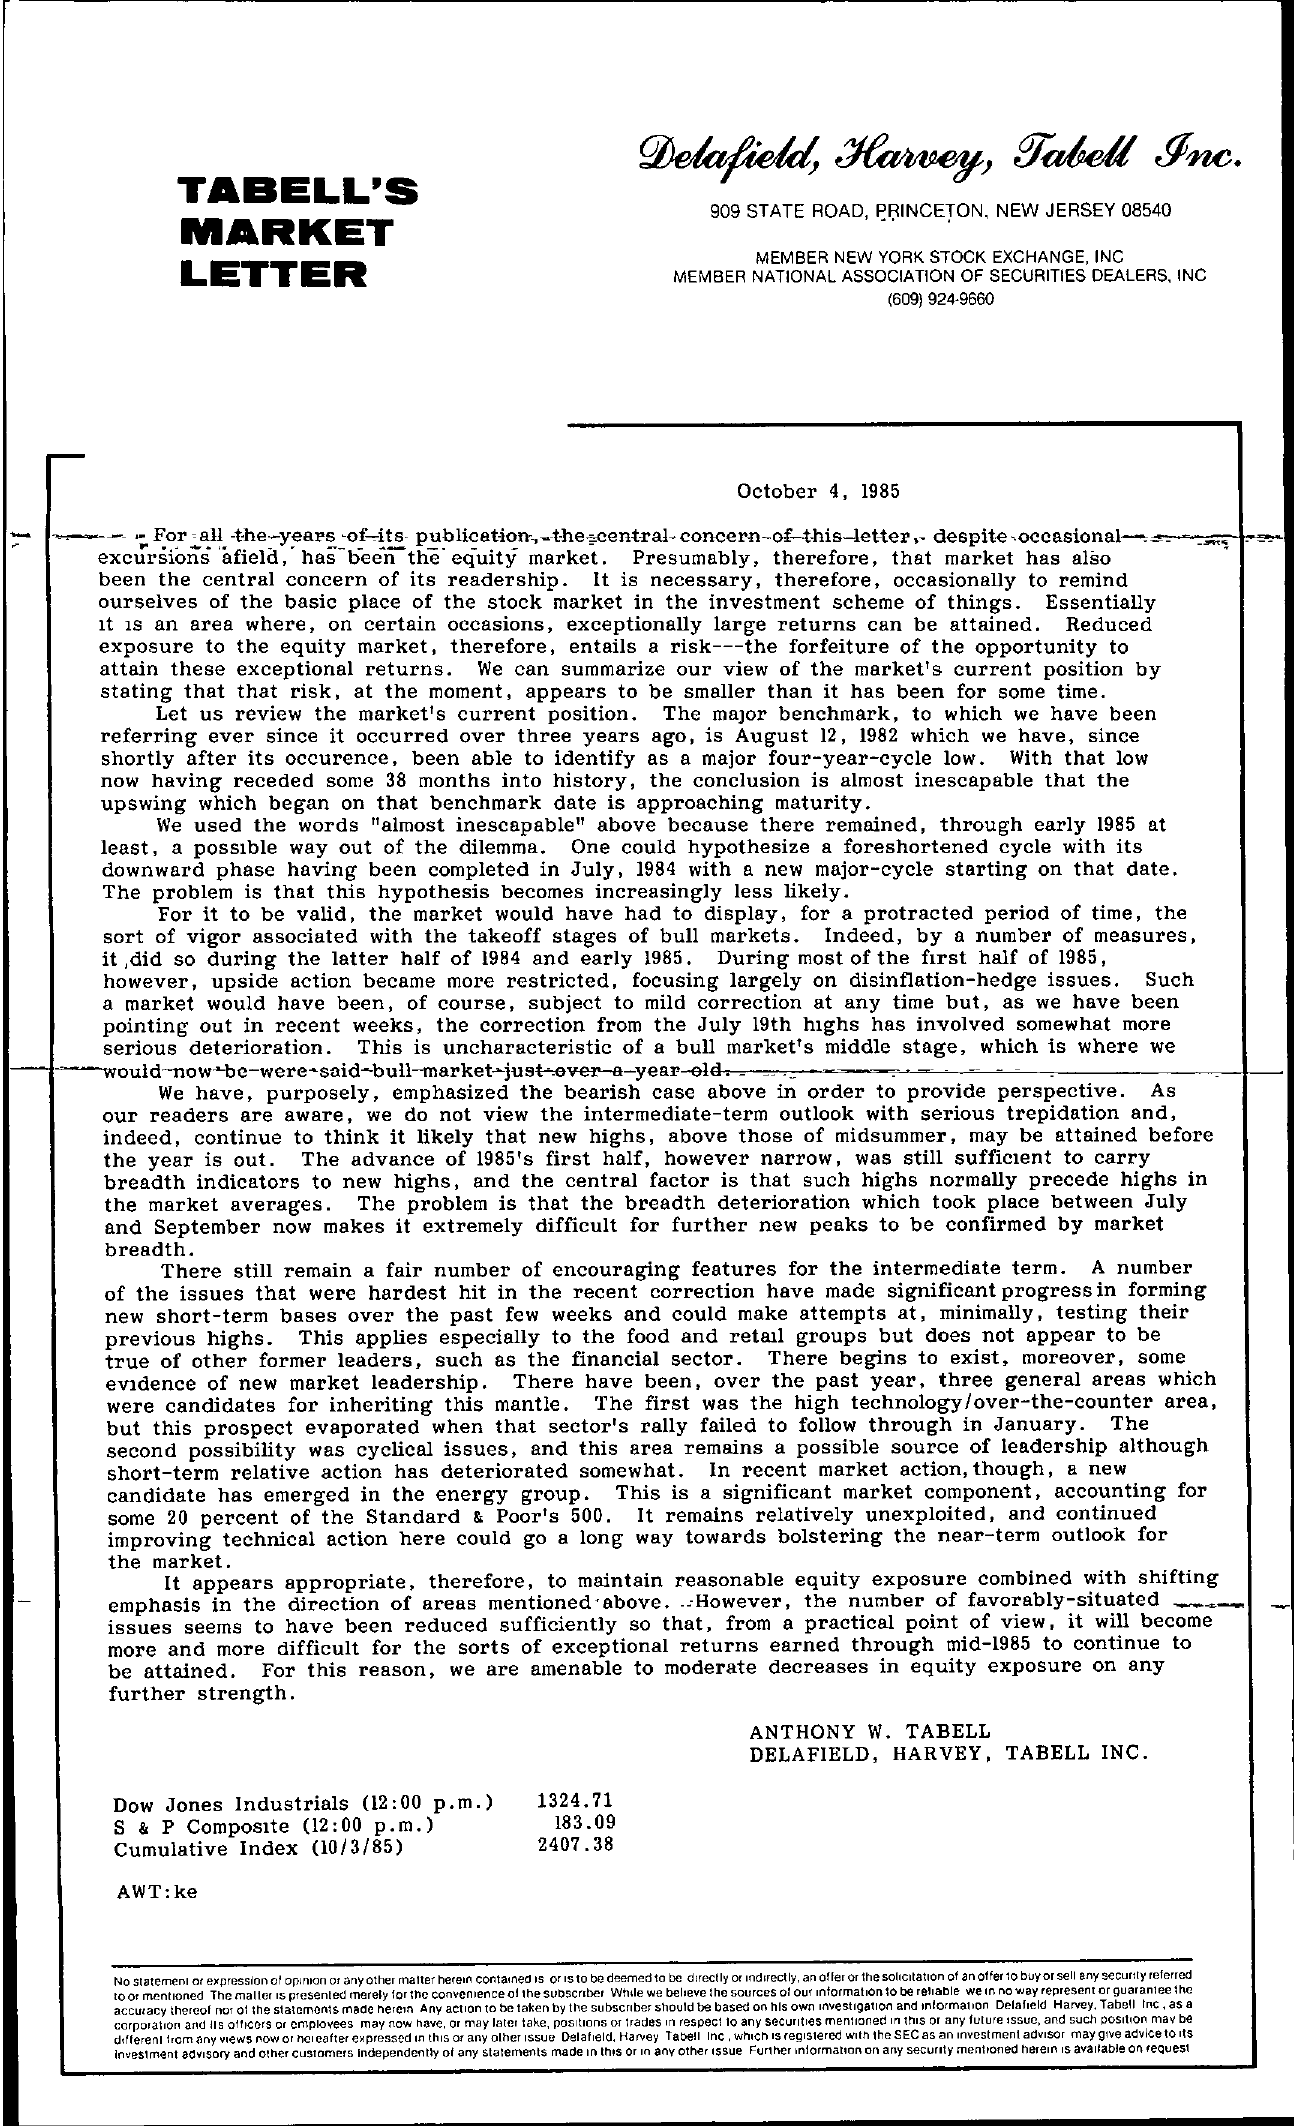 Tabell's Market Letter - October 04, 1985